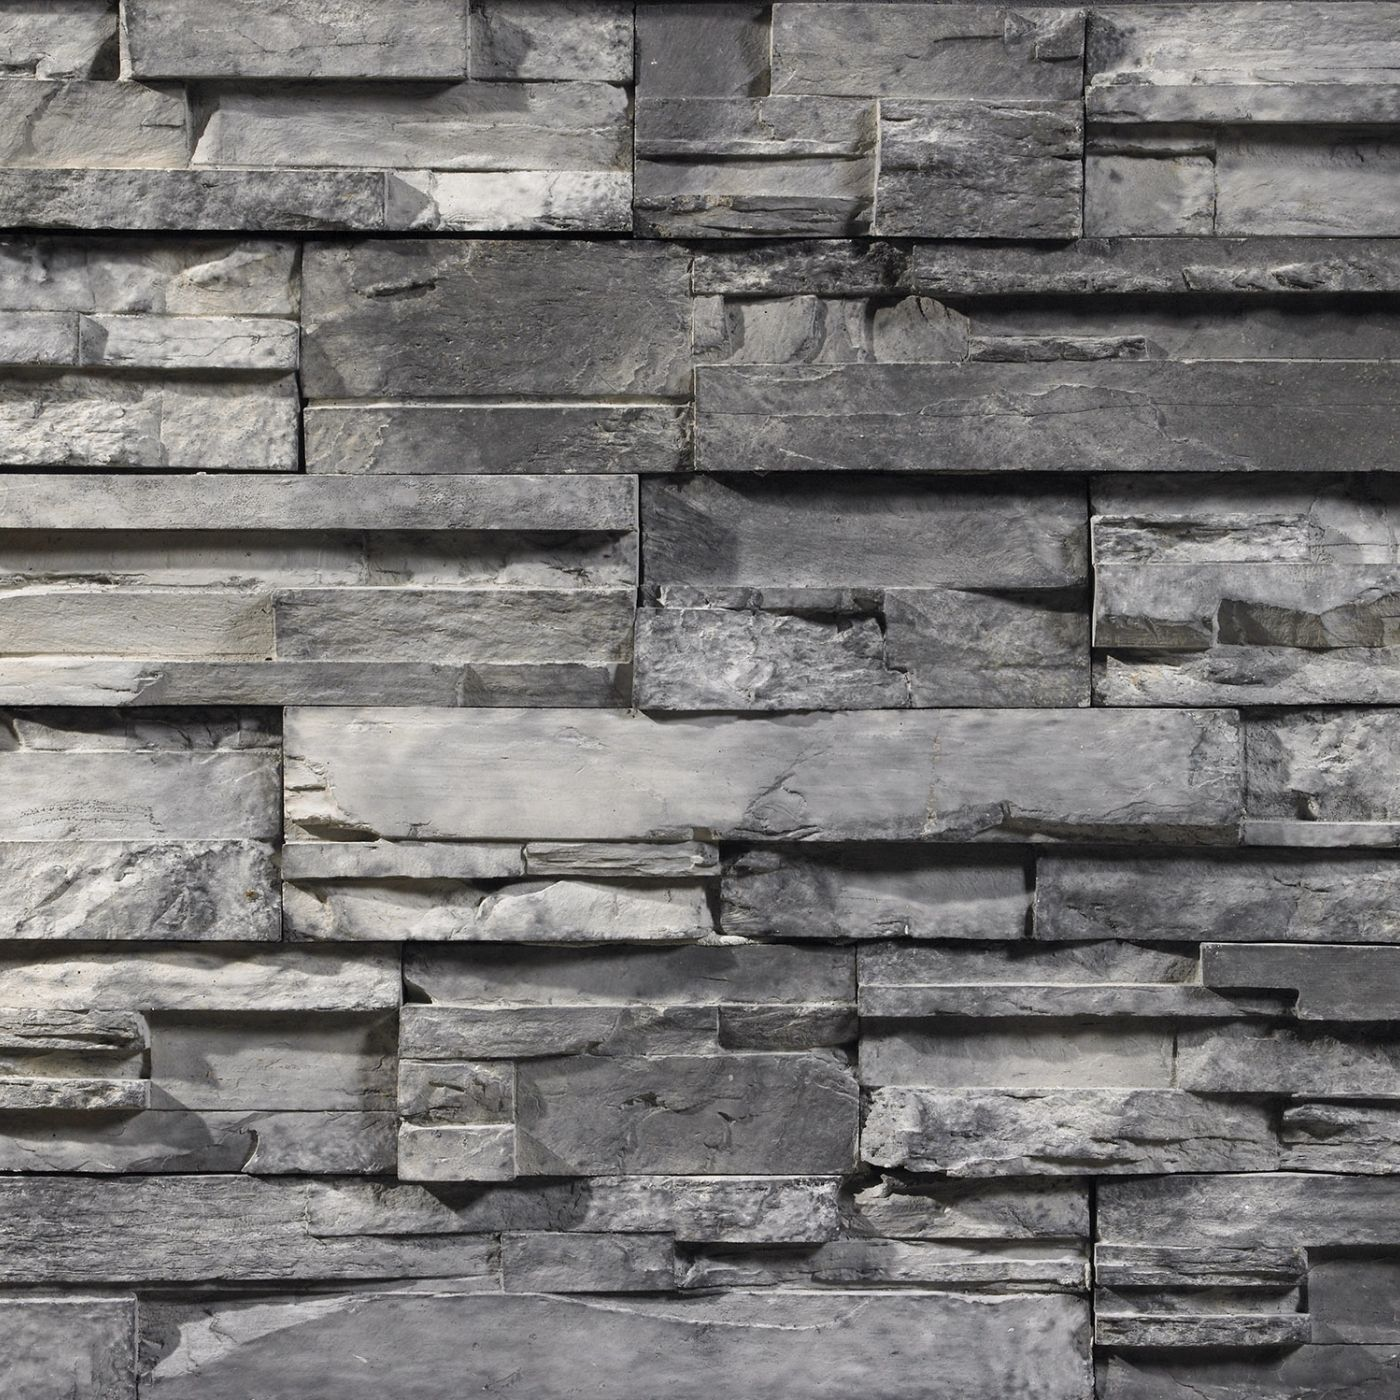 Nantucket Prostack Lite Stone Veneer From Environmental Stoneworks Stone Siding Exterior Stone Veneer Exterior Exterior Stone